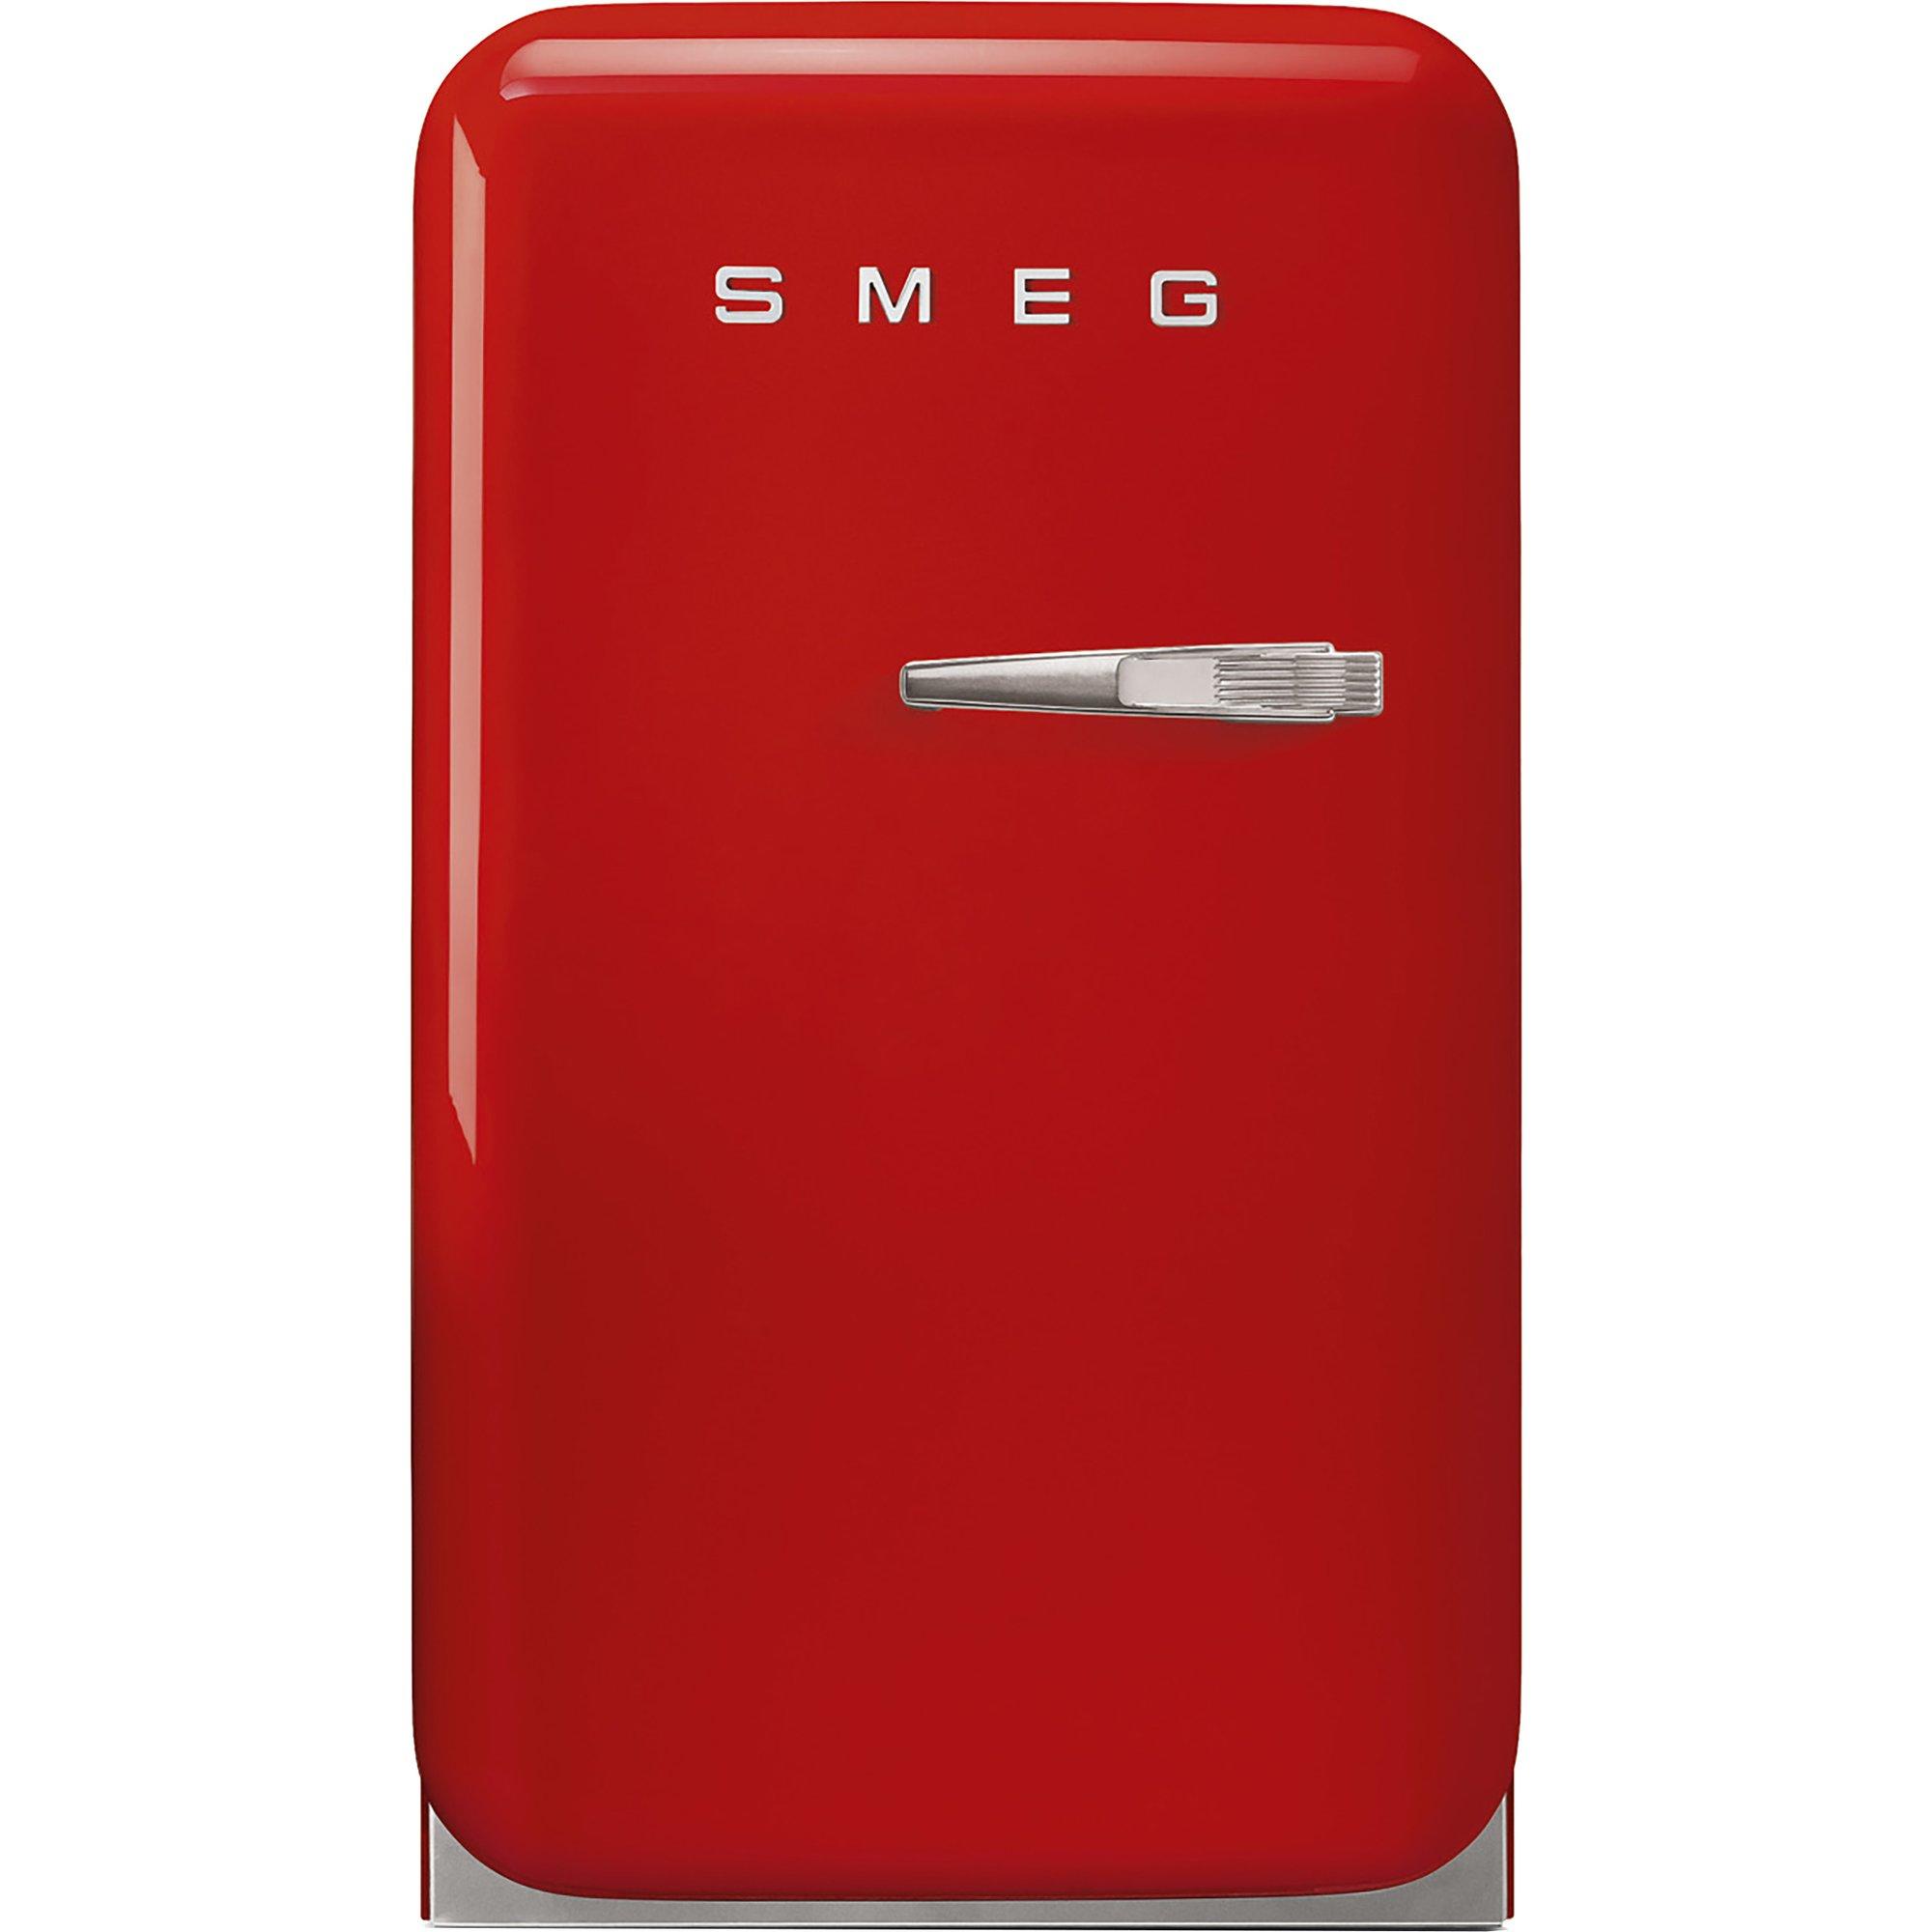 Smeg 74 cm kylskåp i retrostil vänsterhängt – röd